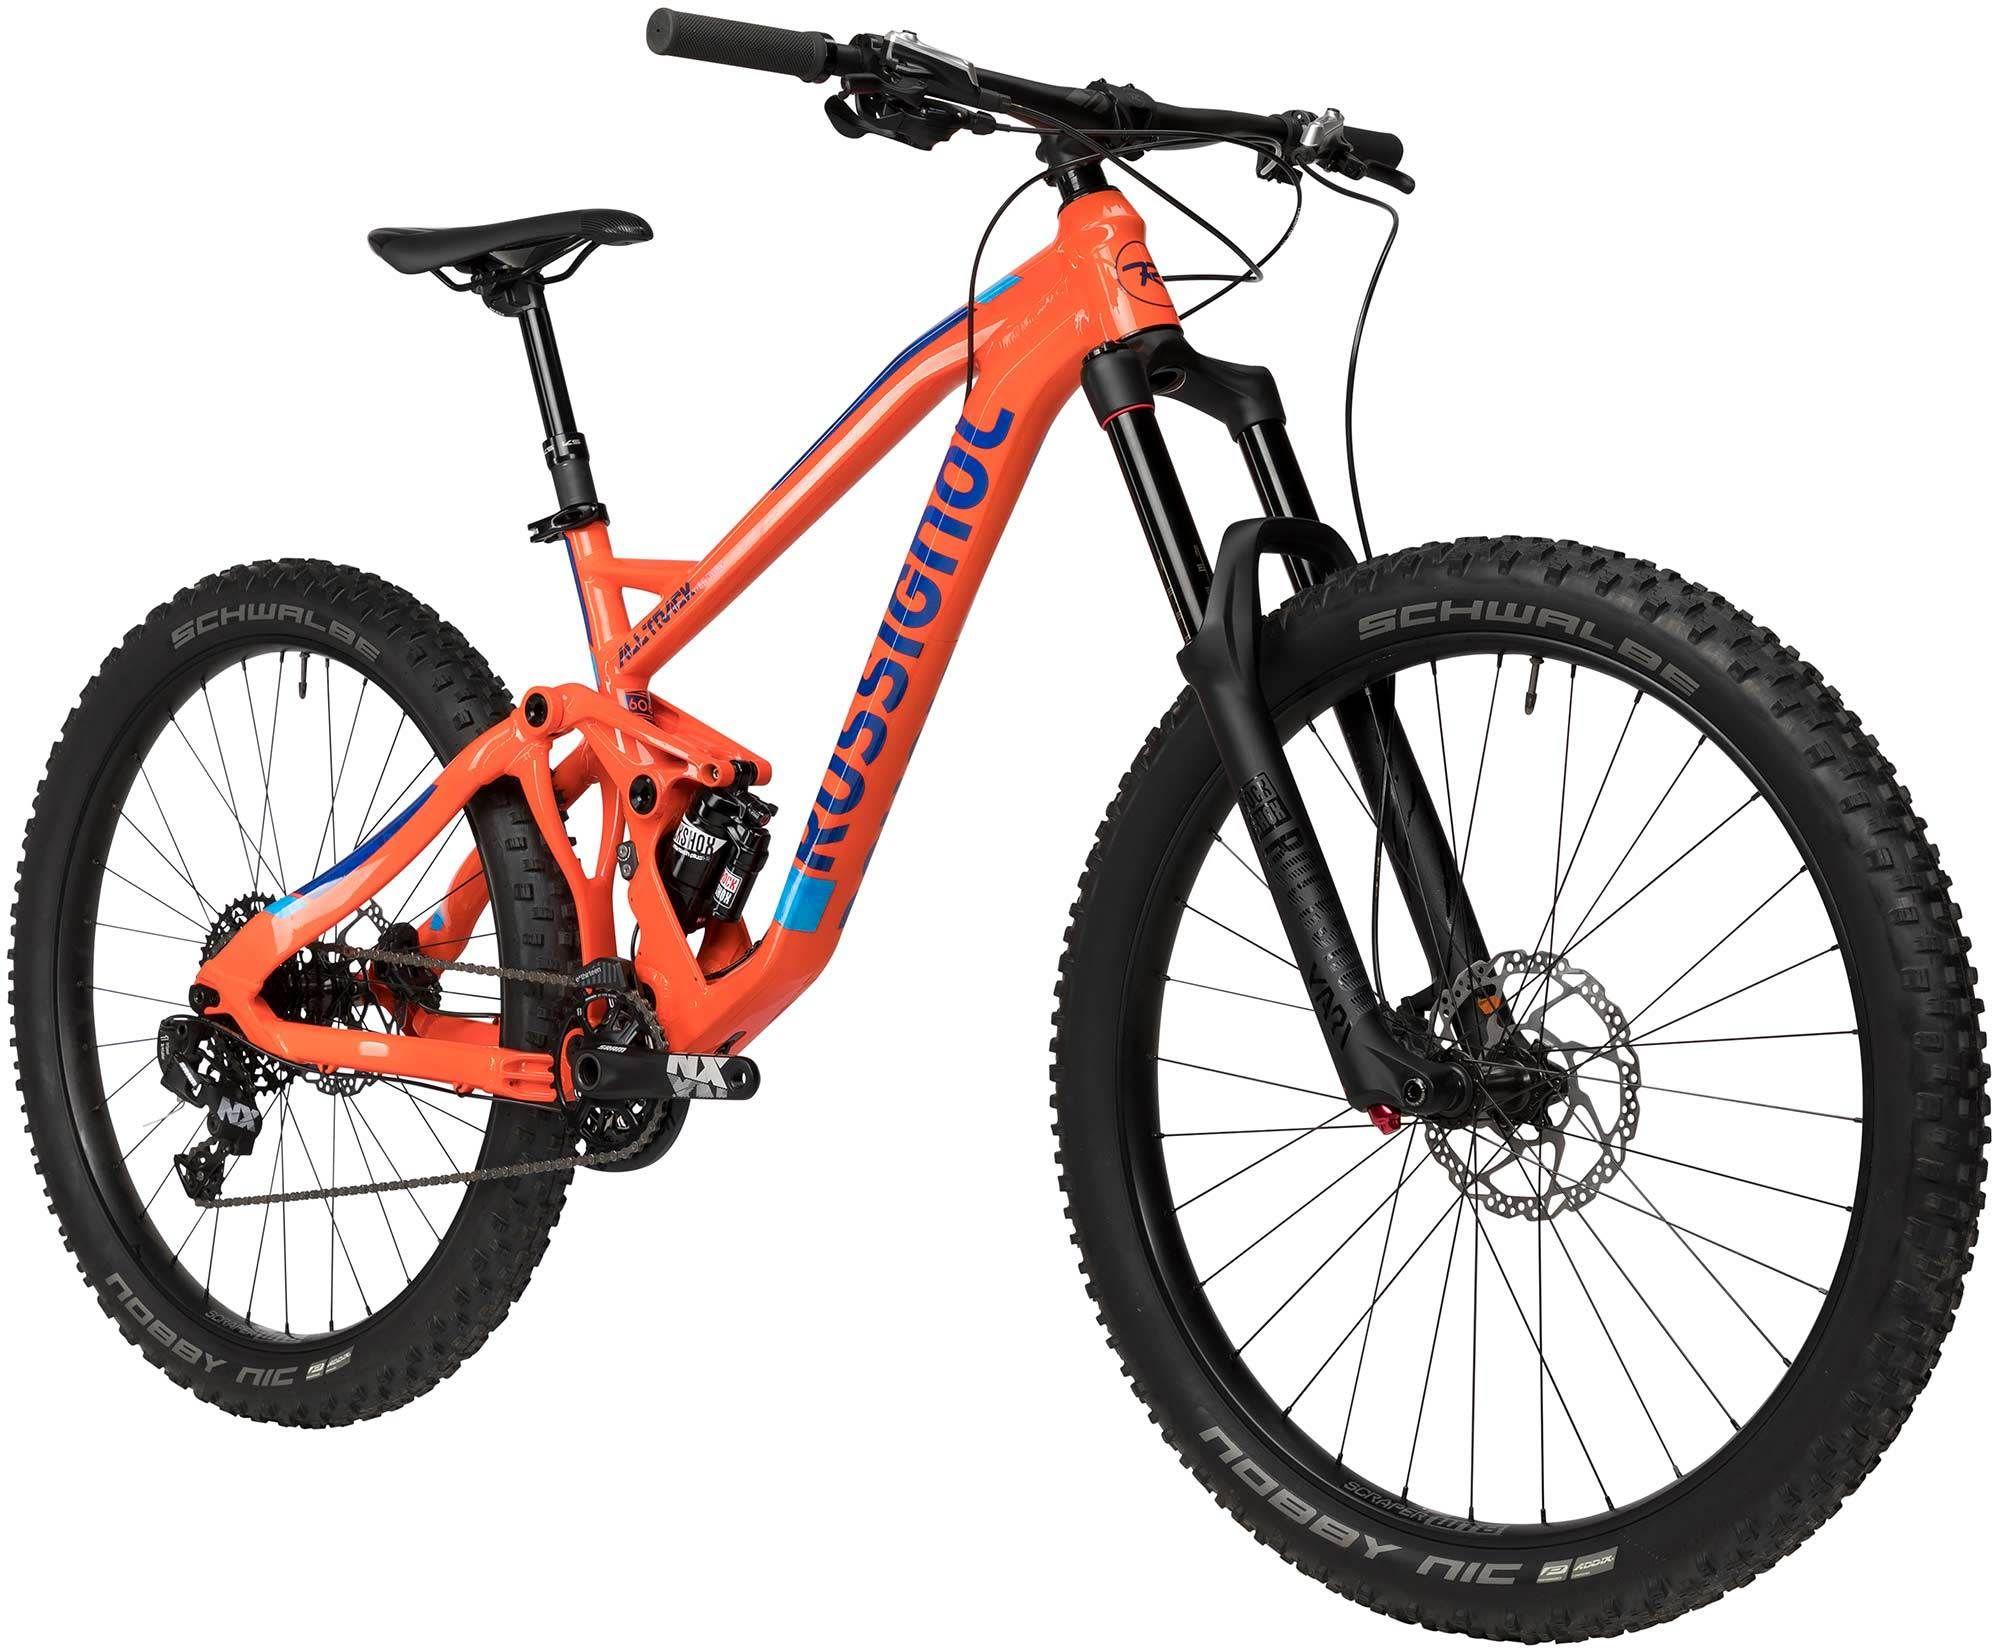 35de98c0200 Rossignol All Track Enduro Bike